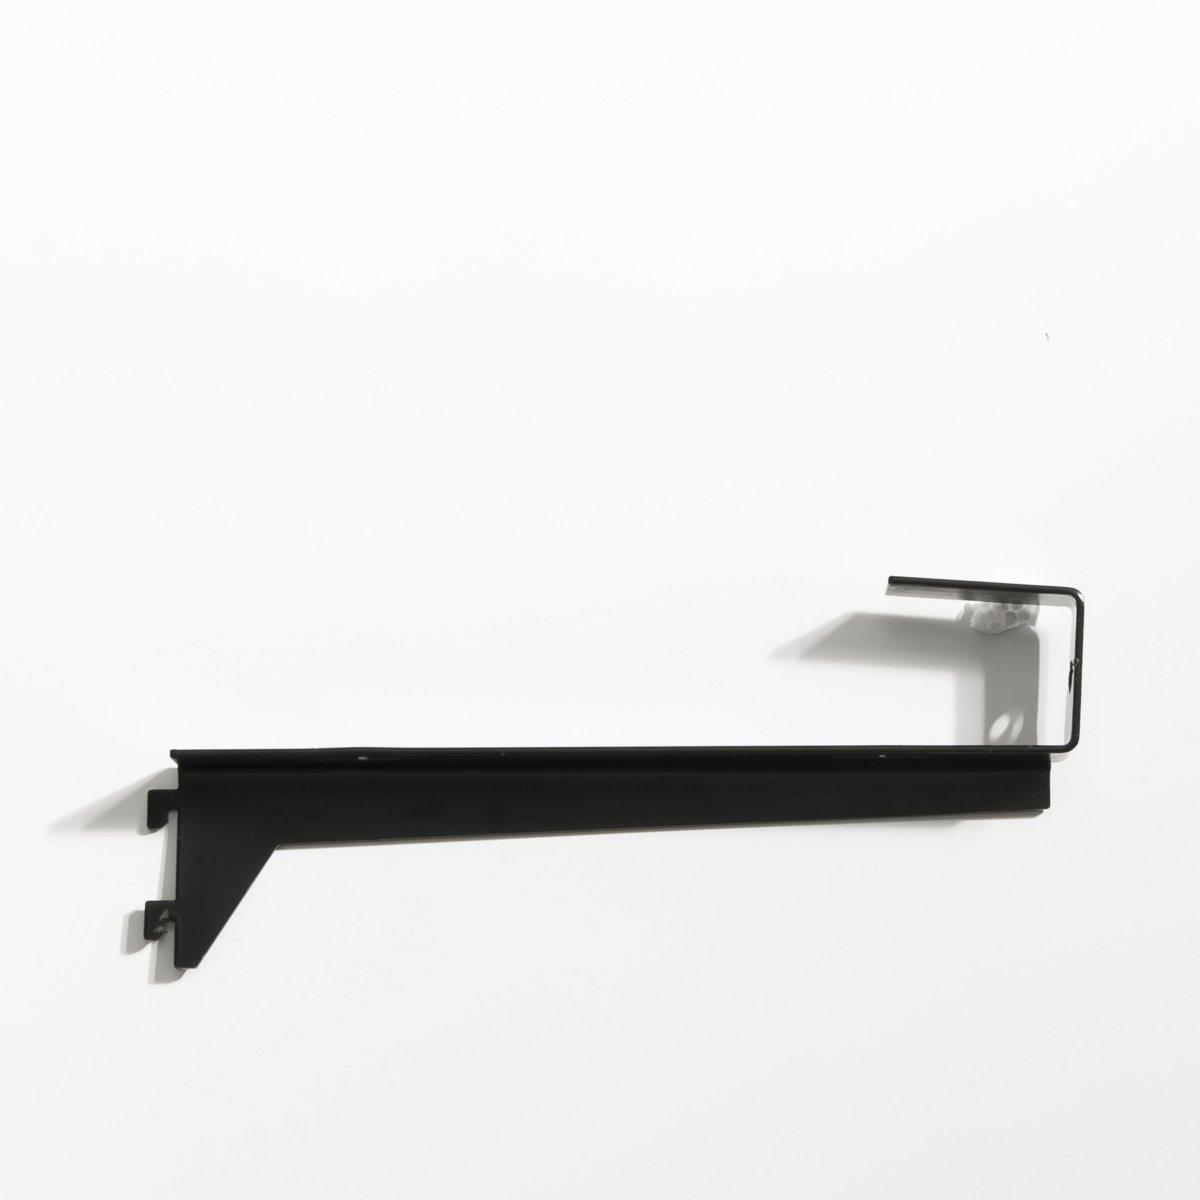 Кронштейн угловой для этажерок Kyriel (2 шт) от La Redoute